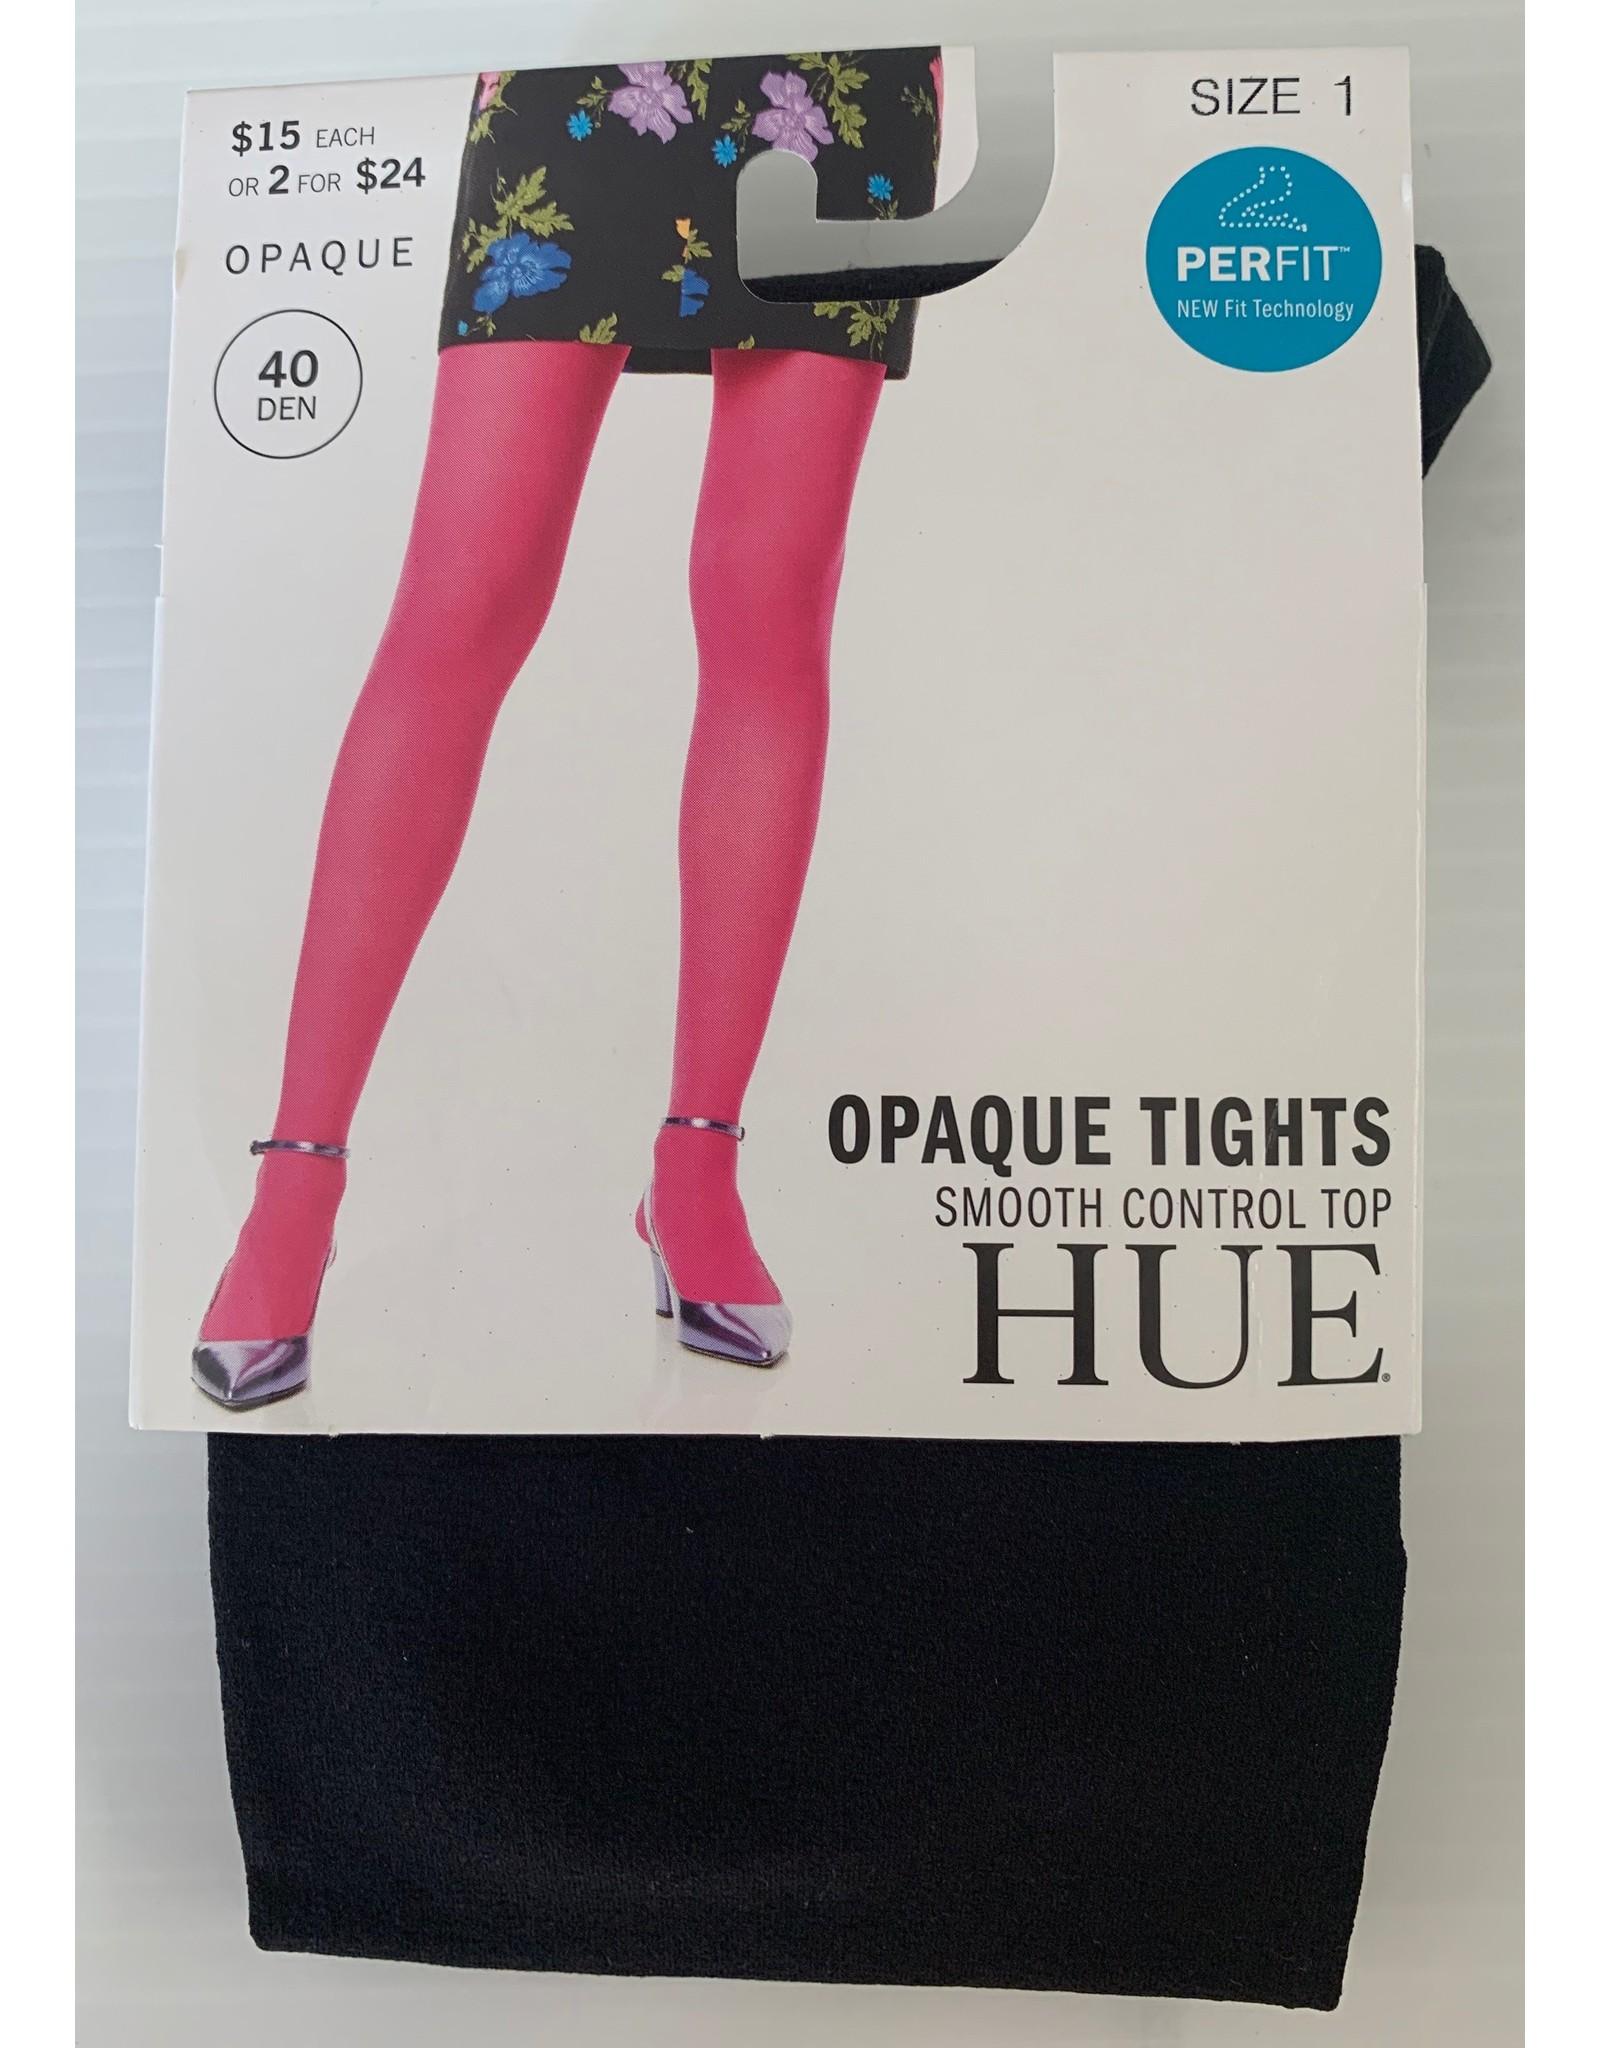 Hue Hue 40 Denier Opaque Tights Smooth Control TOP U4690